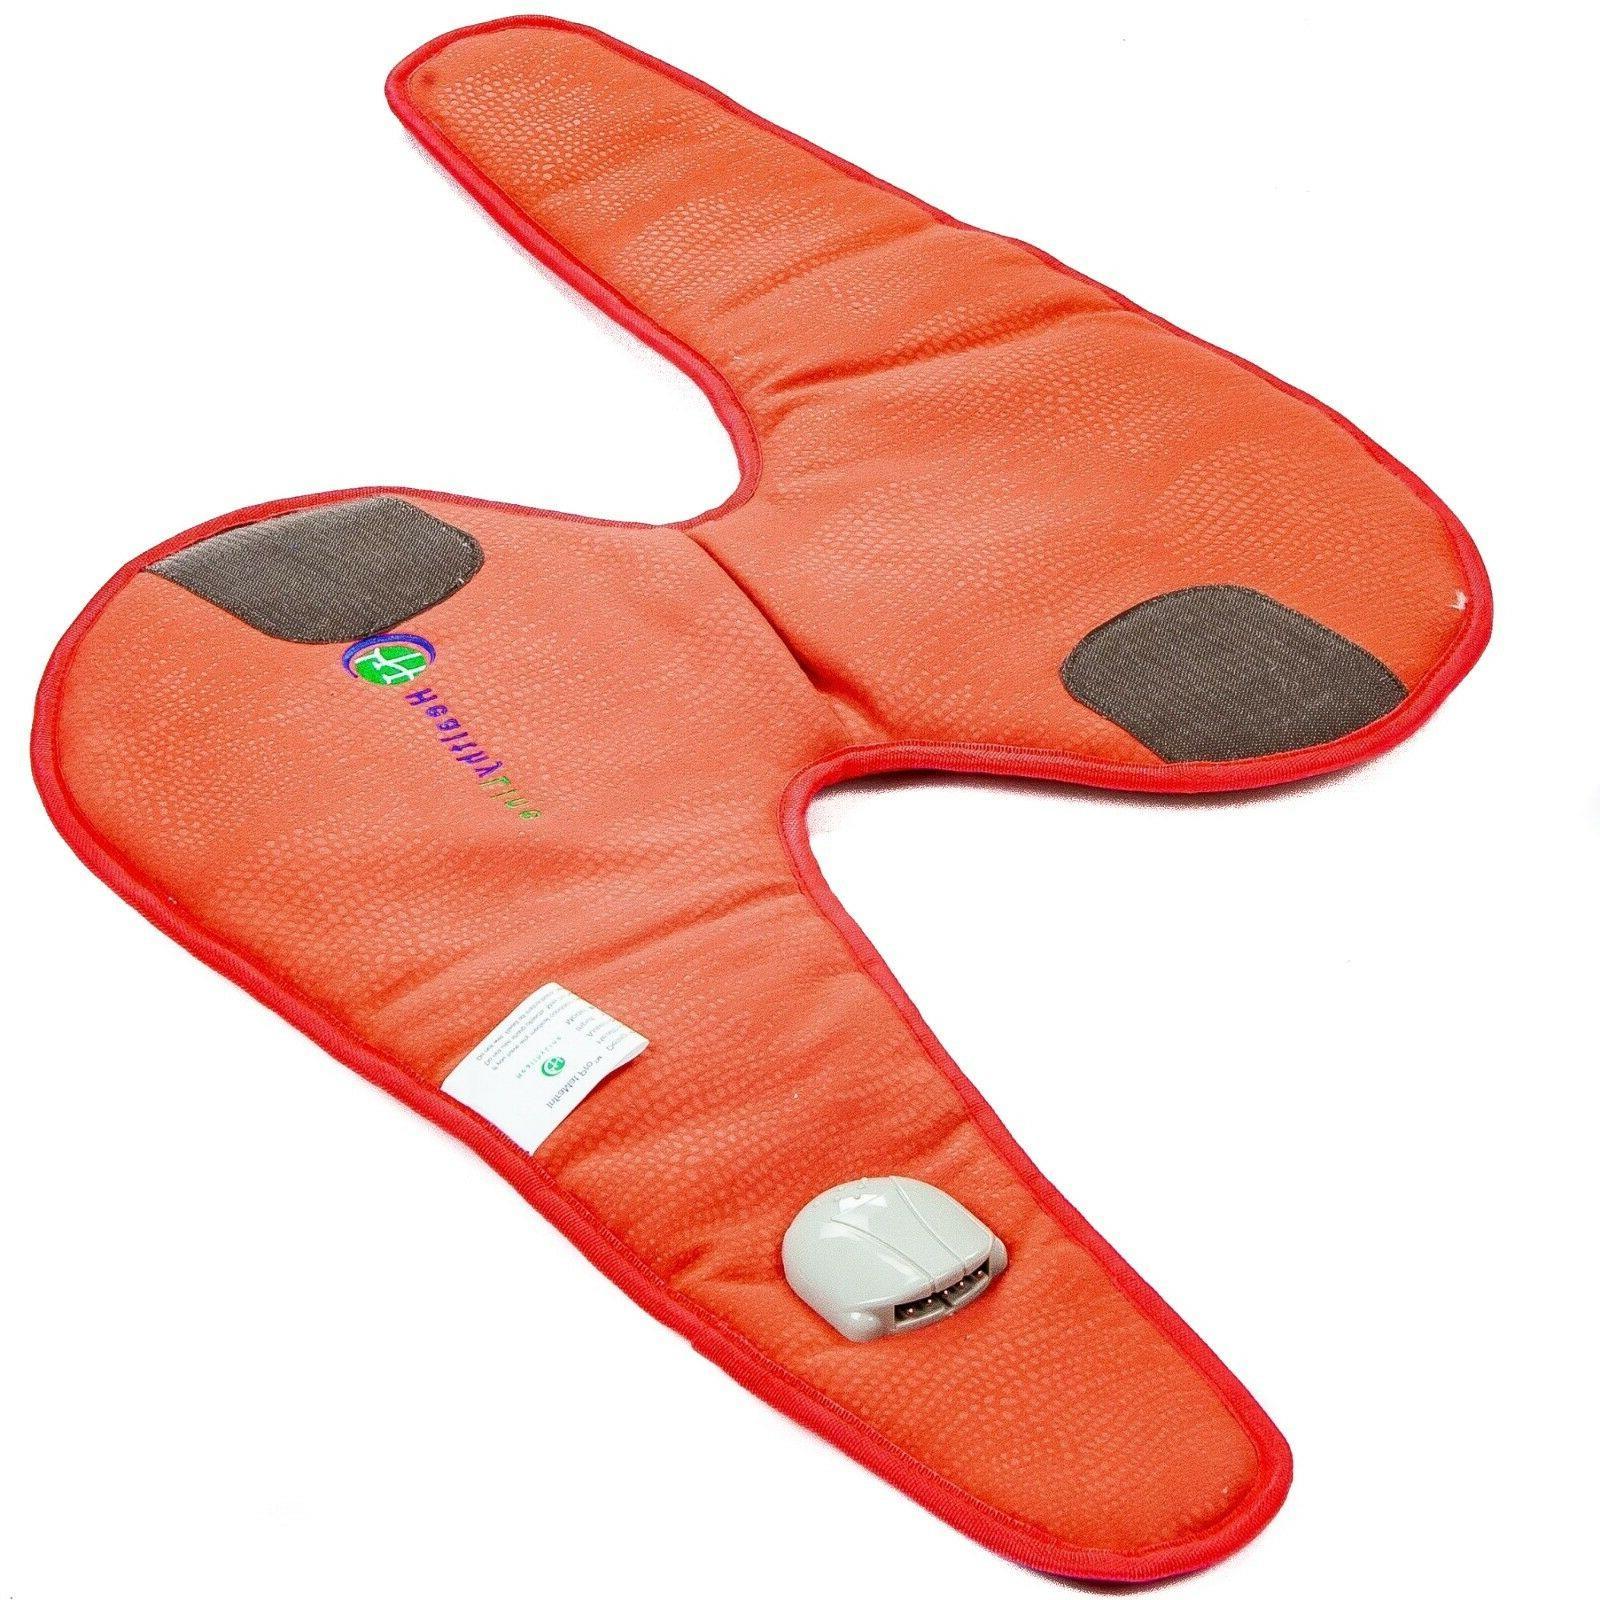 HealthyLine Hot Heating Knee Brace Pad Infrared